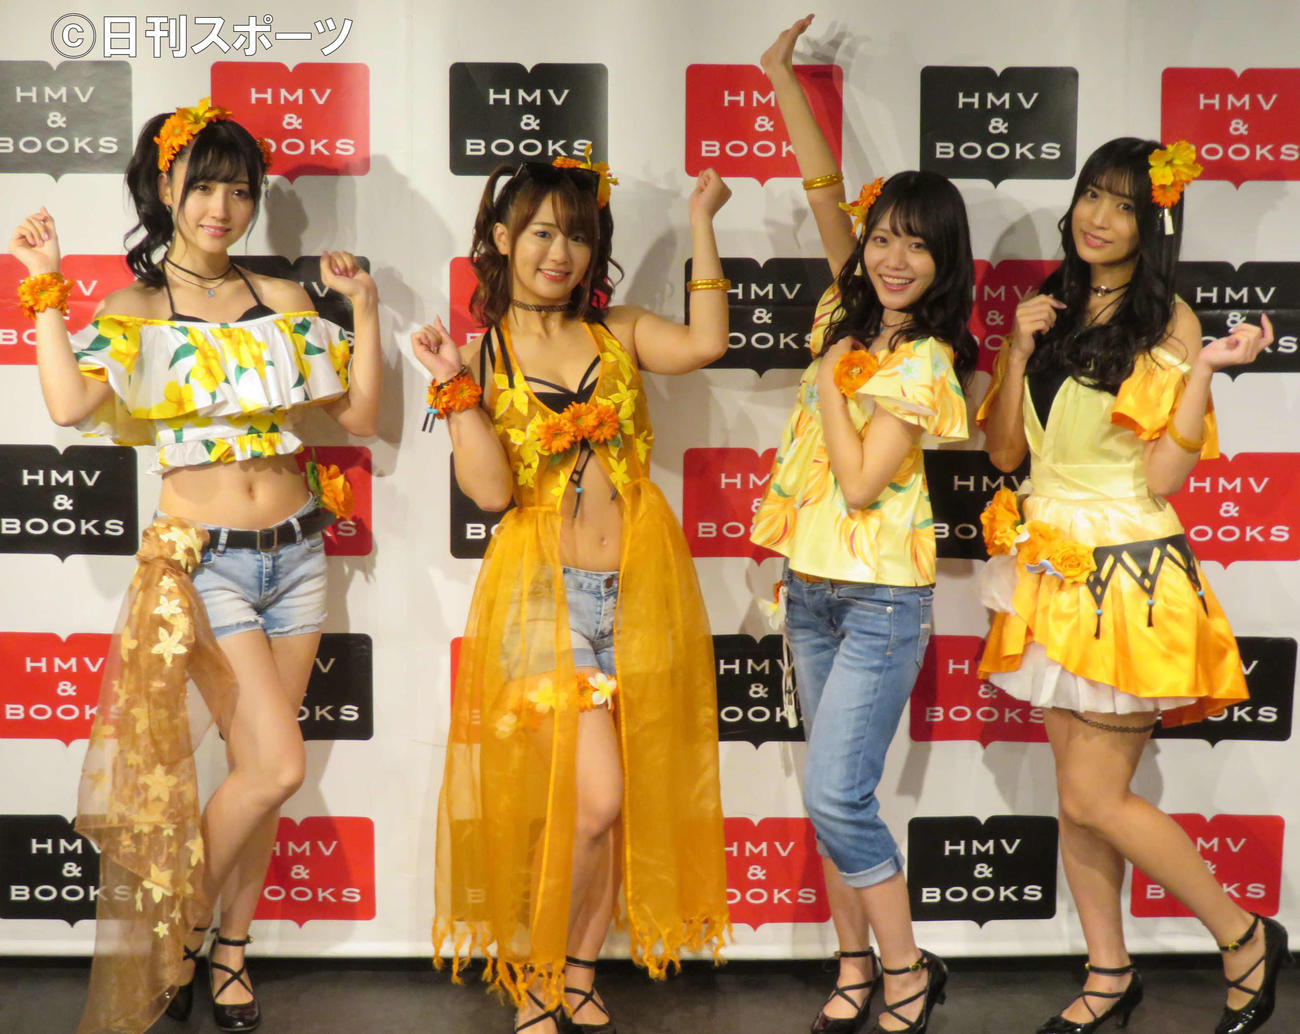 「Merm4id from D4DJ Summer Flower Love Dream」ブルーレイ発売記念イベントを開いた、左から岡田夢以、平嶋夏海、葉月ひまり、根岸愛(撮影・村上幸将)